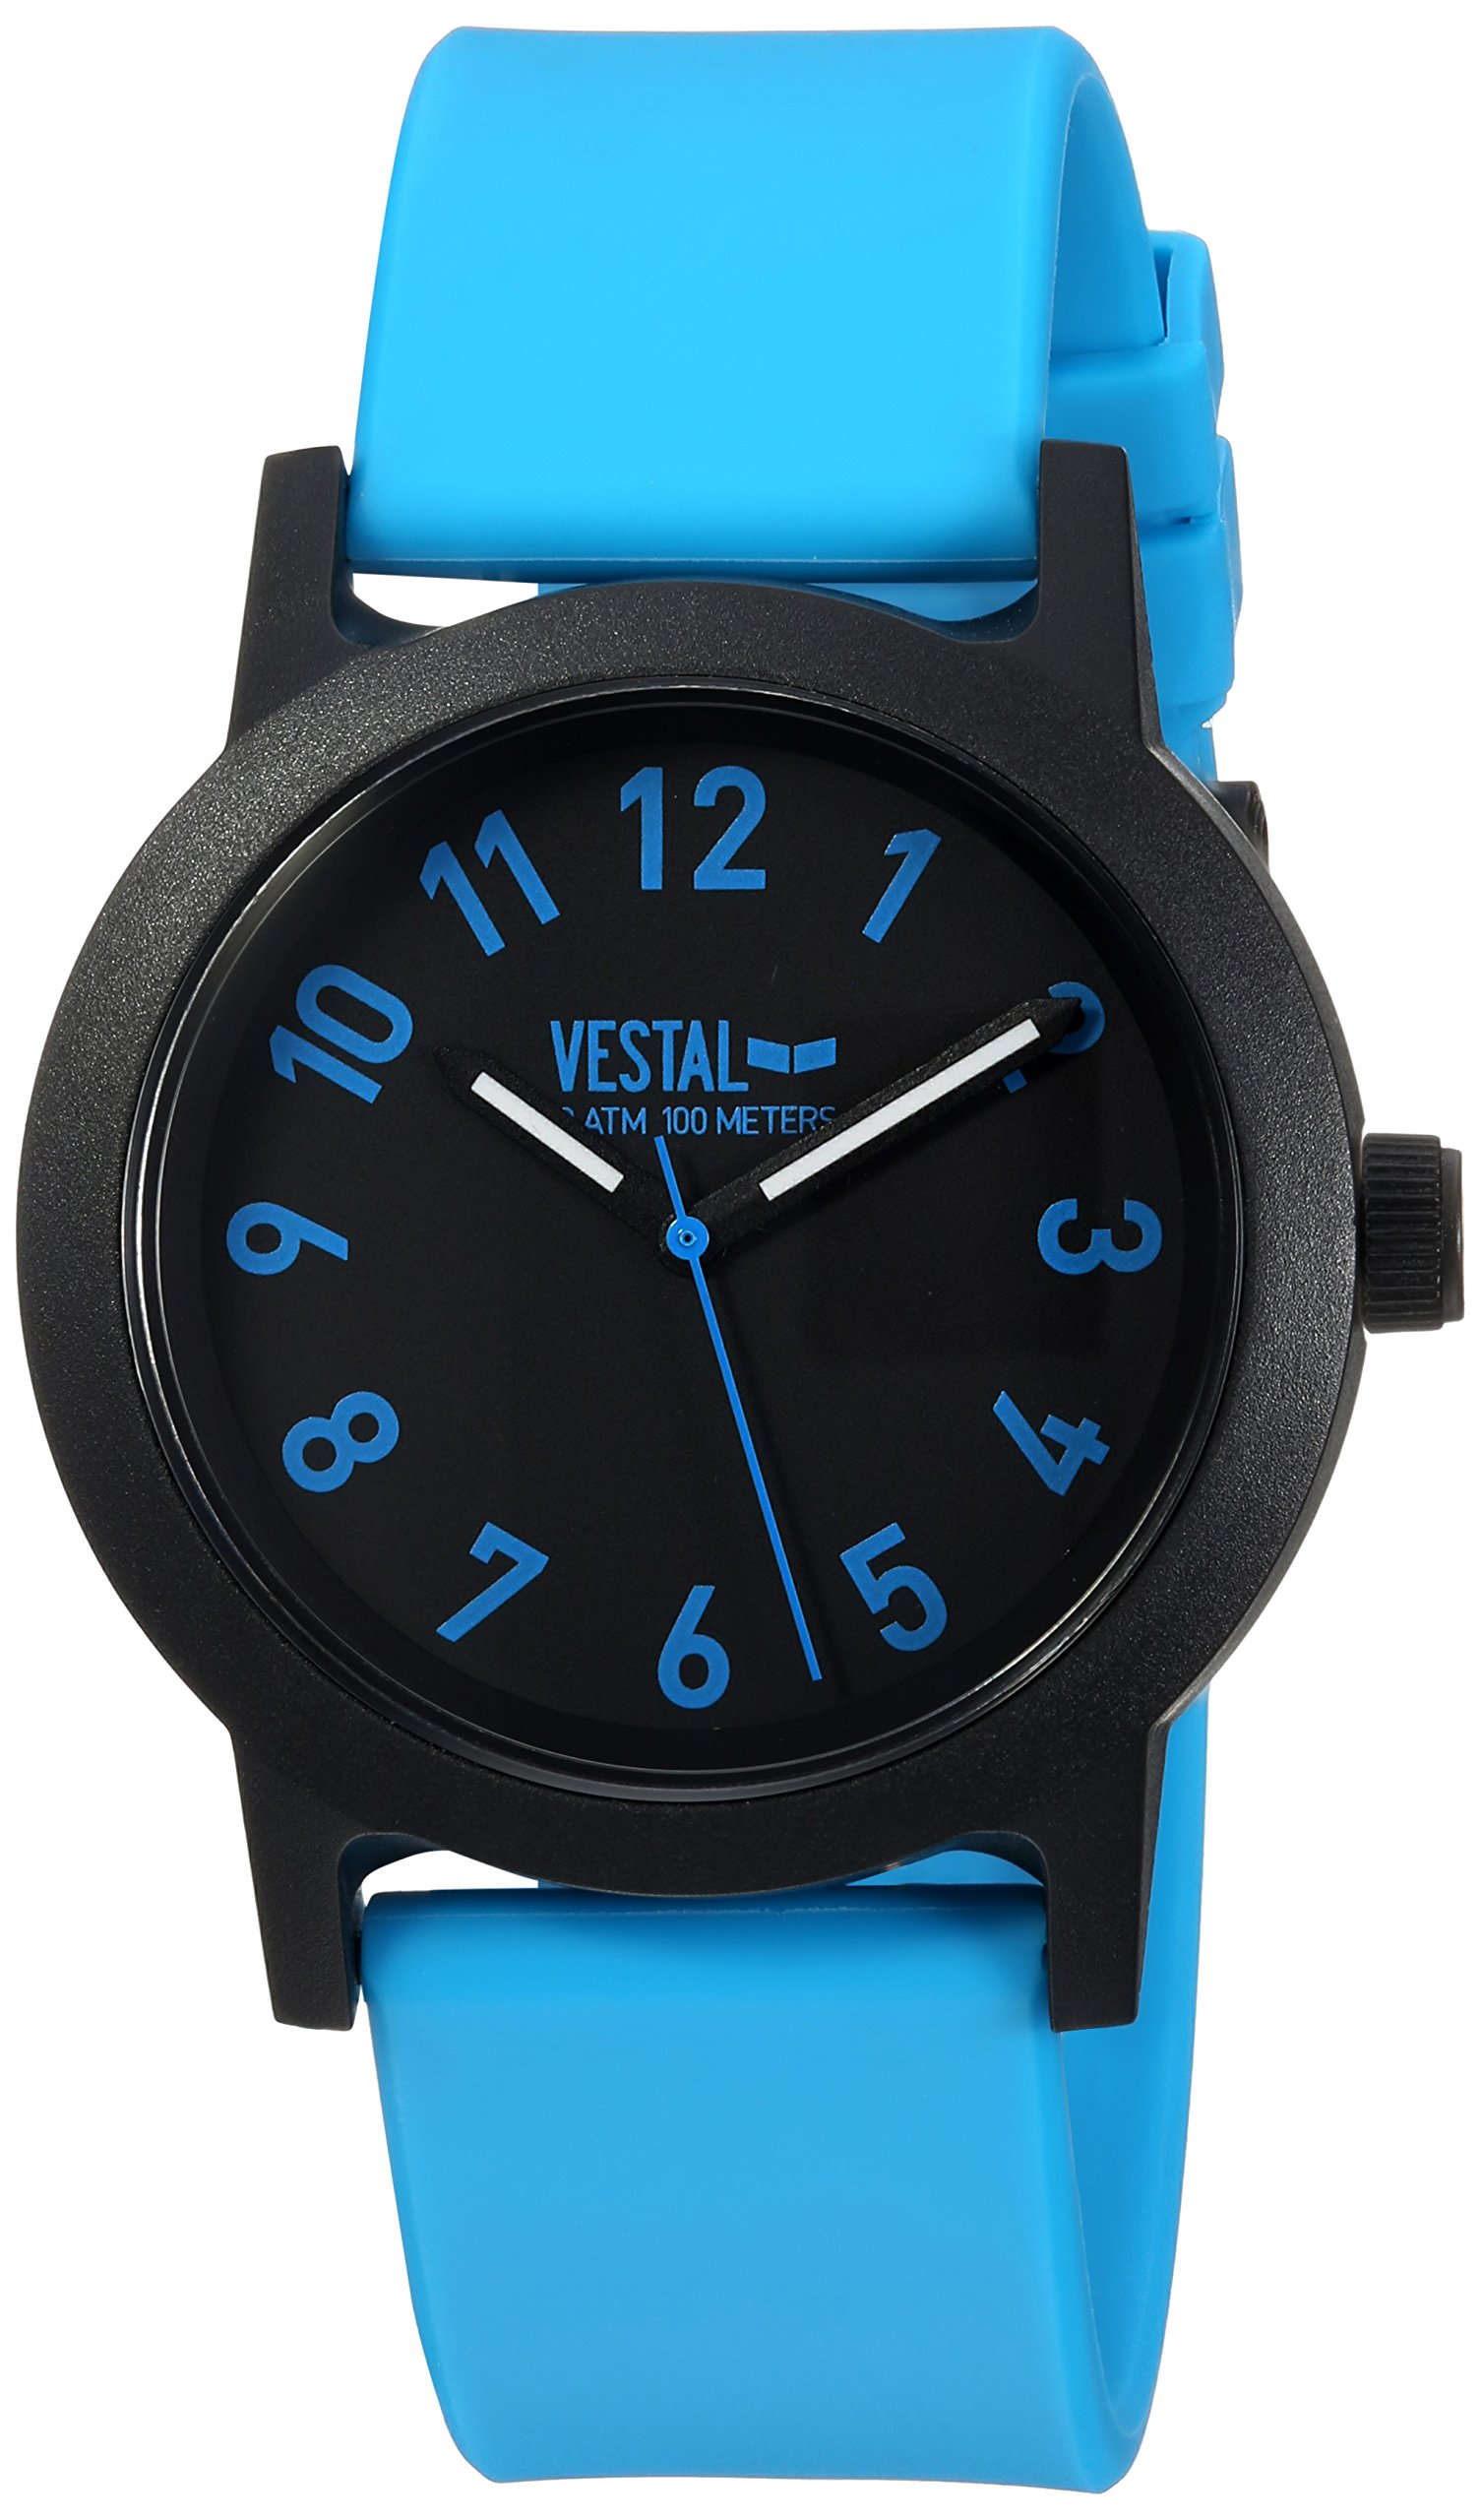 Vestal Alpha Bravo 10 ATM Japanese-Quartz Watch with Plastic Strap, Blue, 20 (Model: ALP3P06) by VESTAL